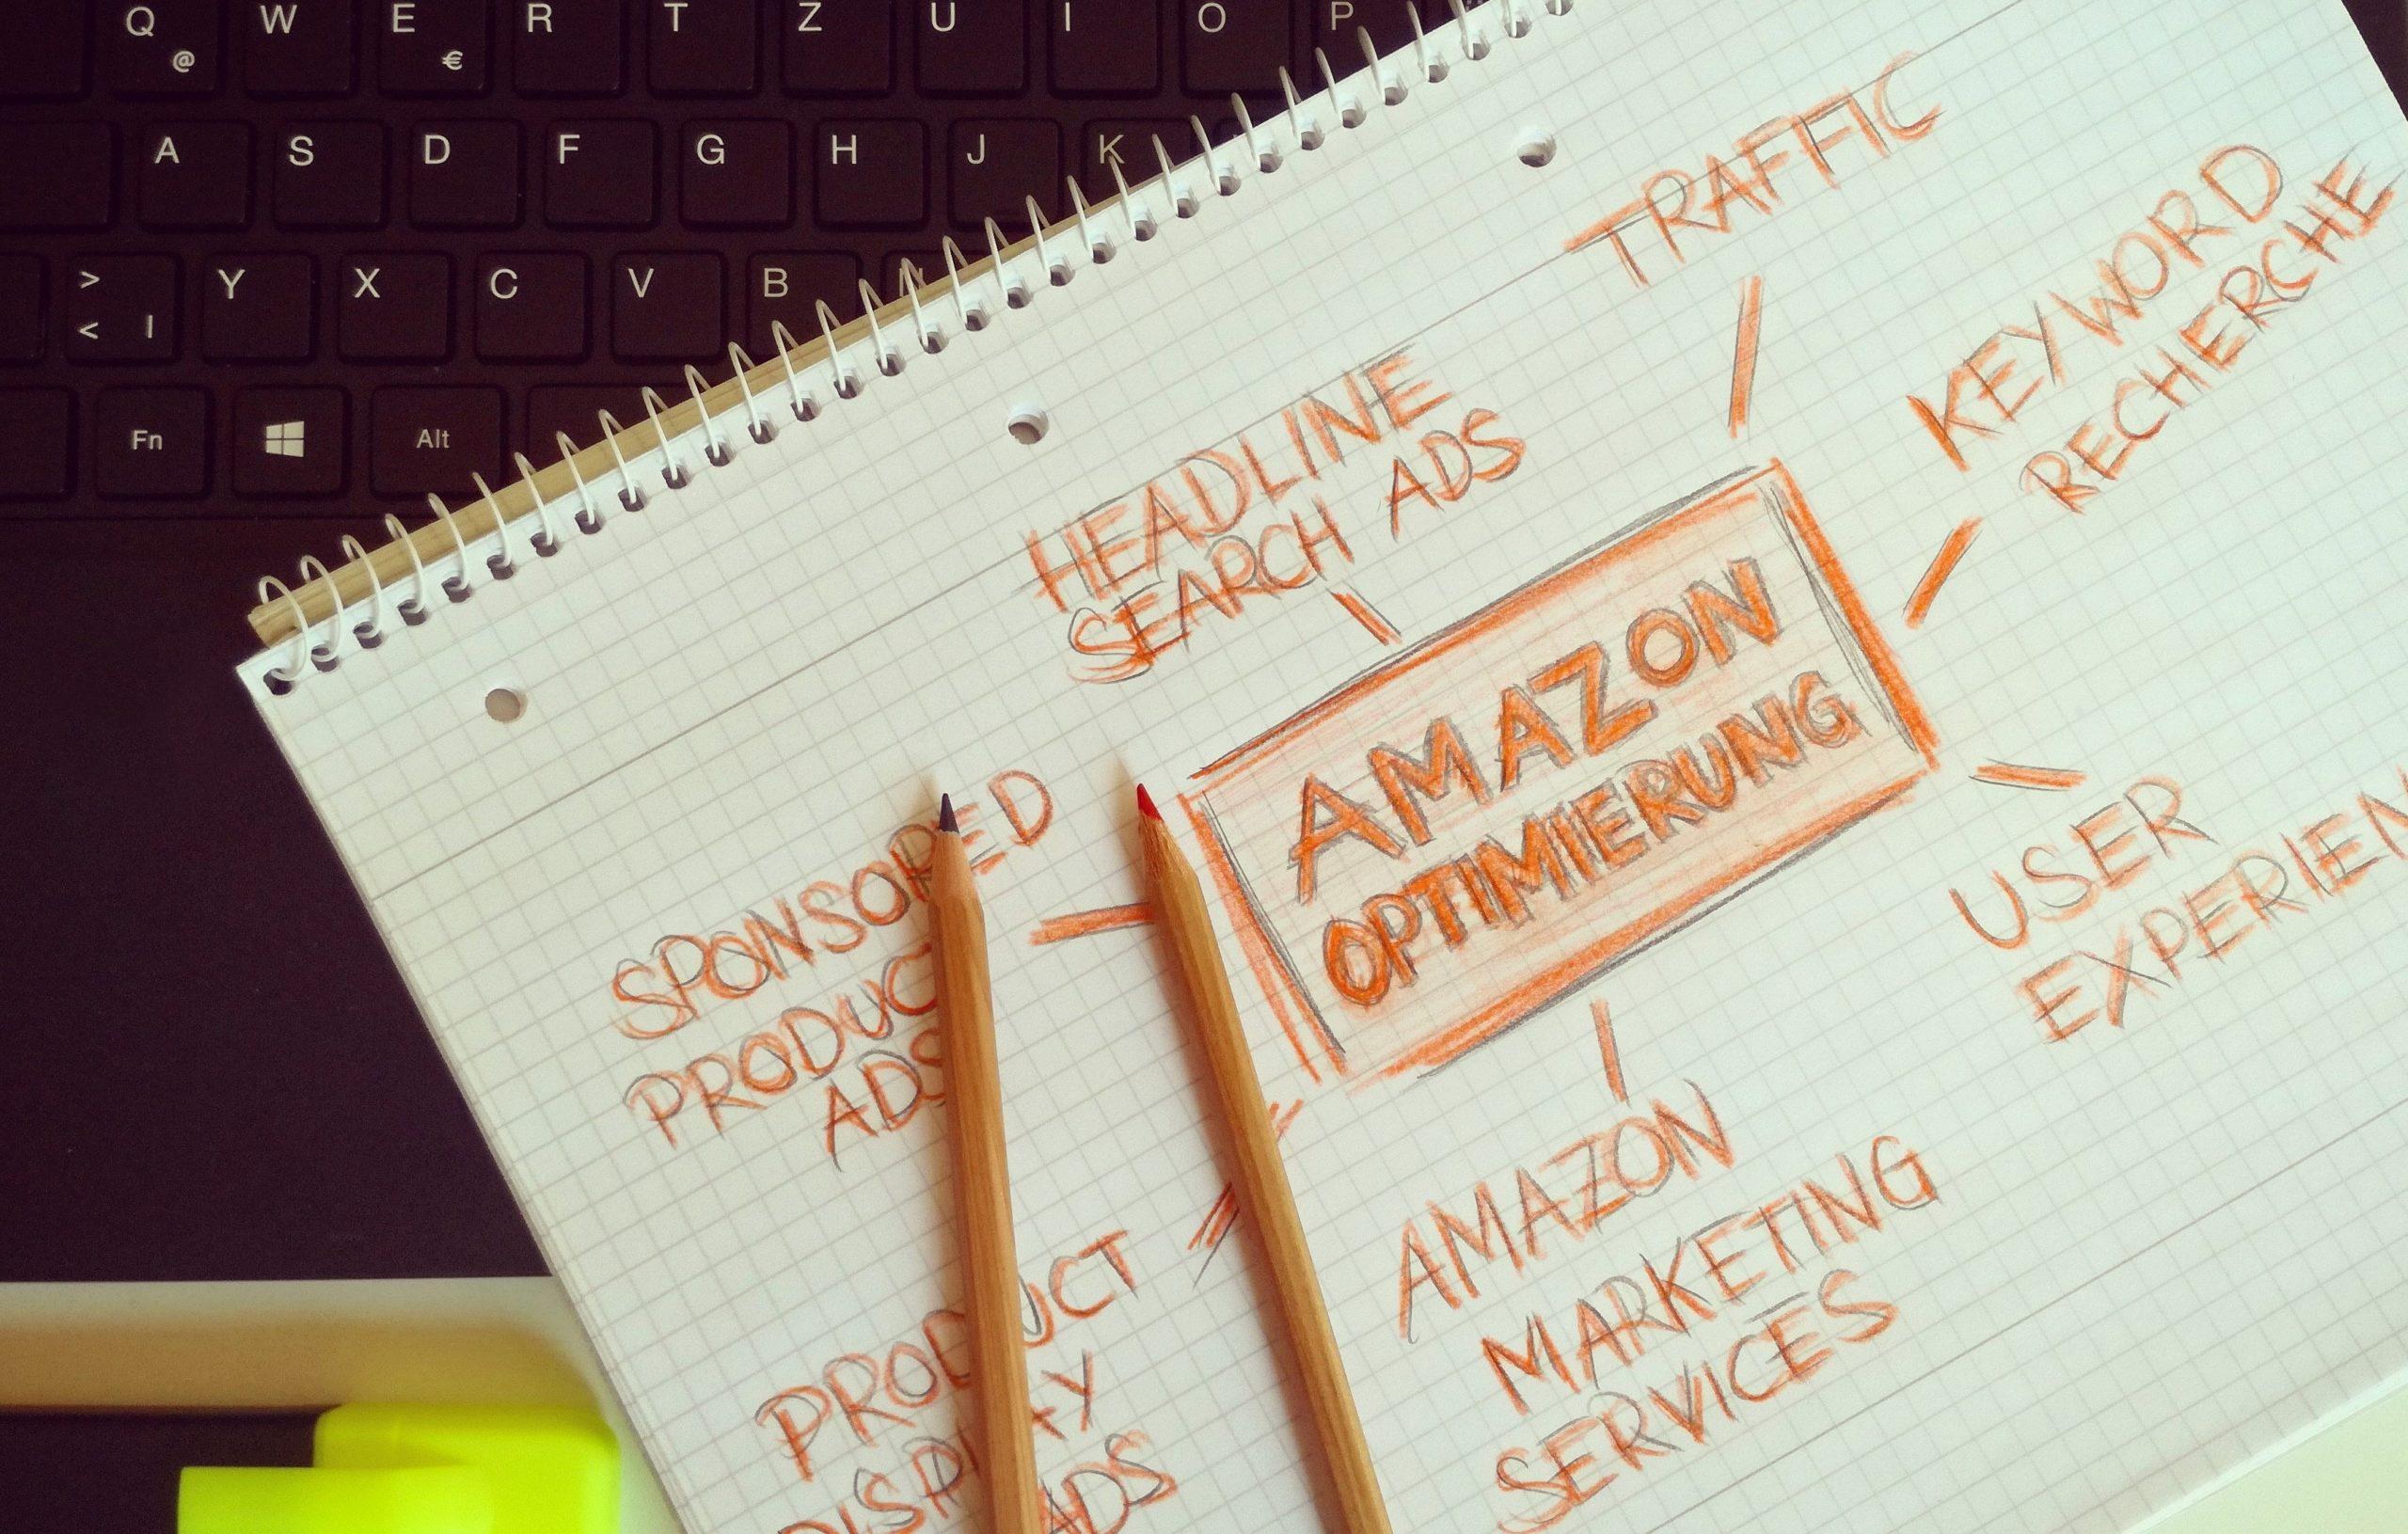 Amazon FBA Tools: Die Tools für dein Amazon FBA Business